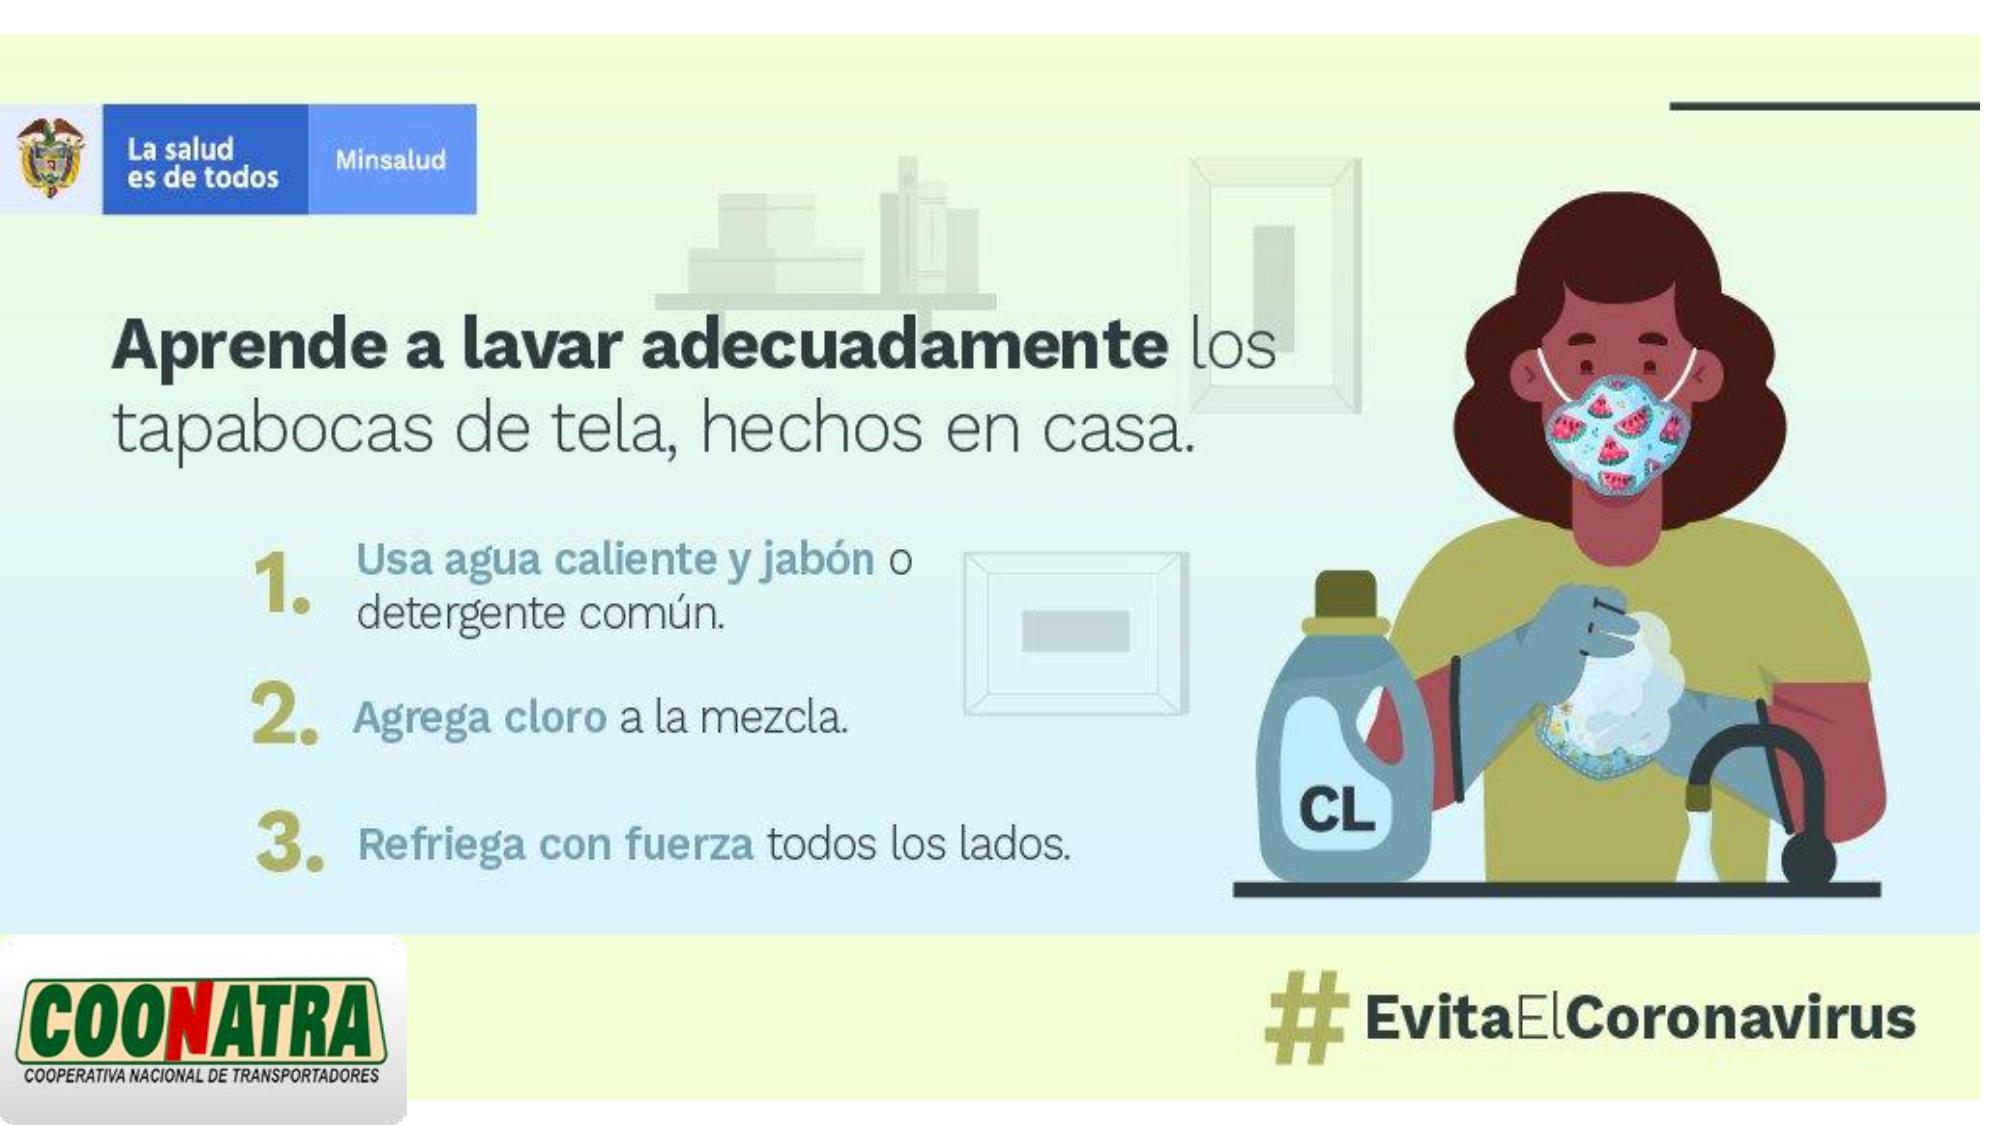 https://0201.nccdn.net/1_2/000/000/0b0/1ab/lavado-de-tapabocas_page-0001.jpg